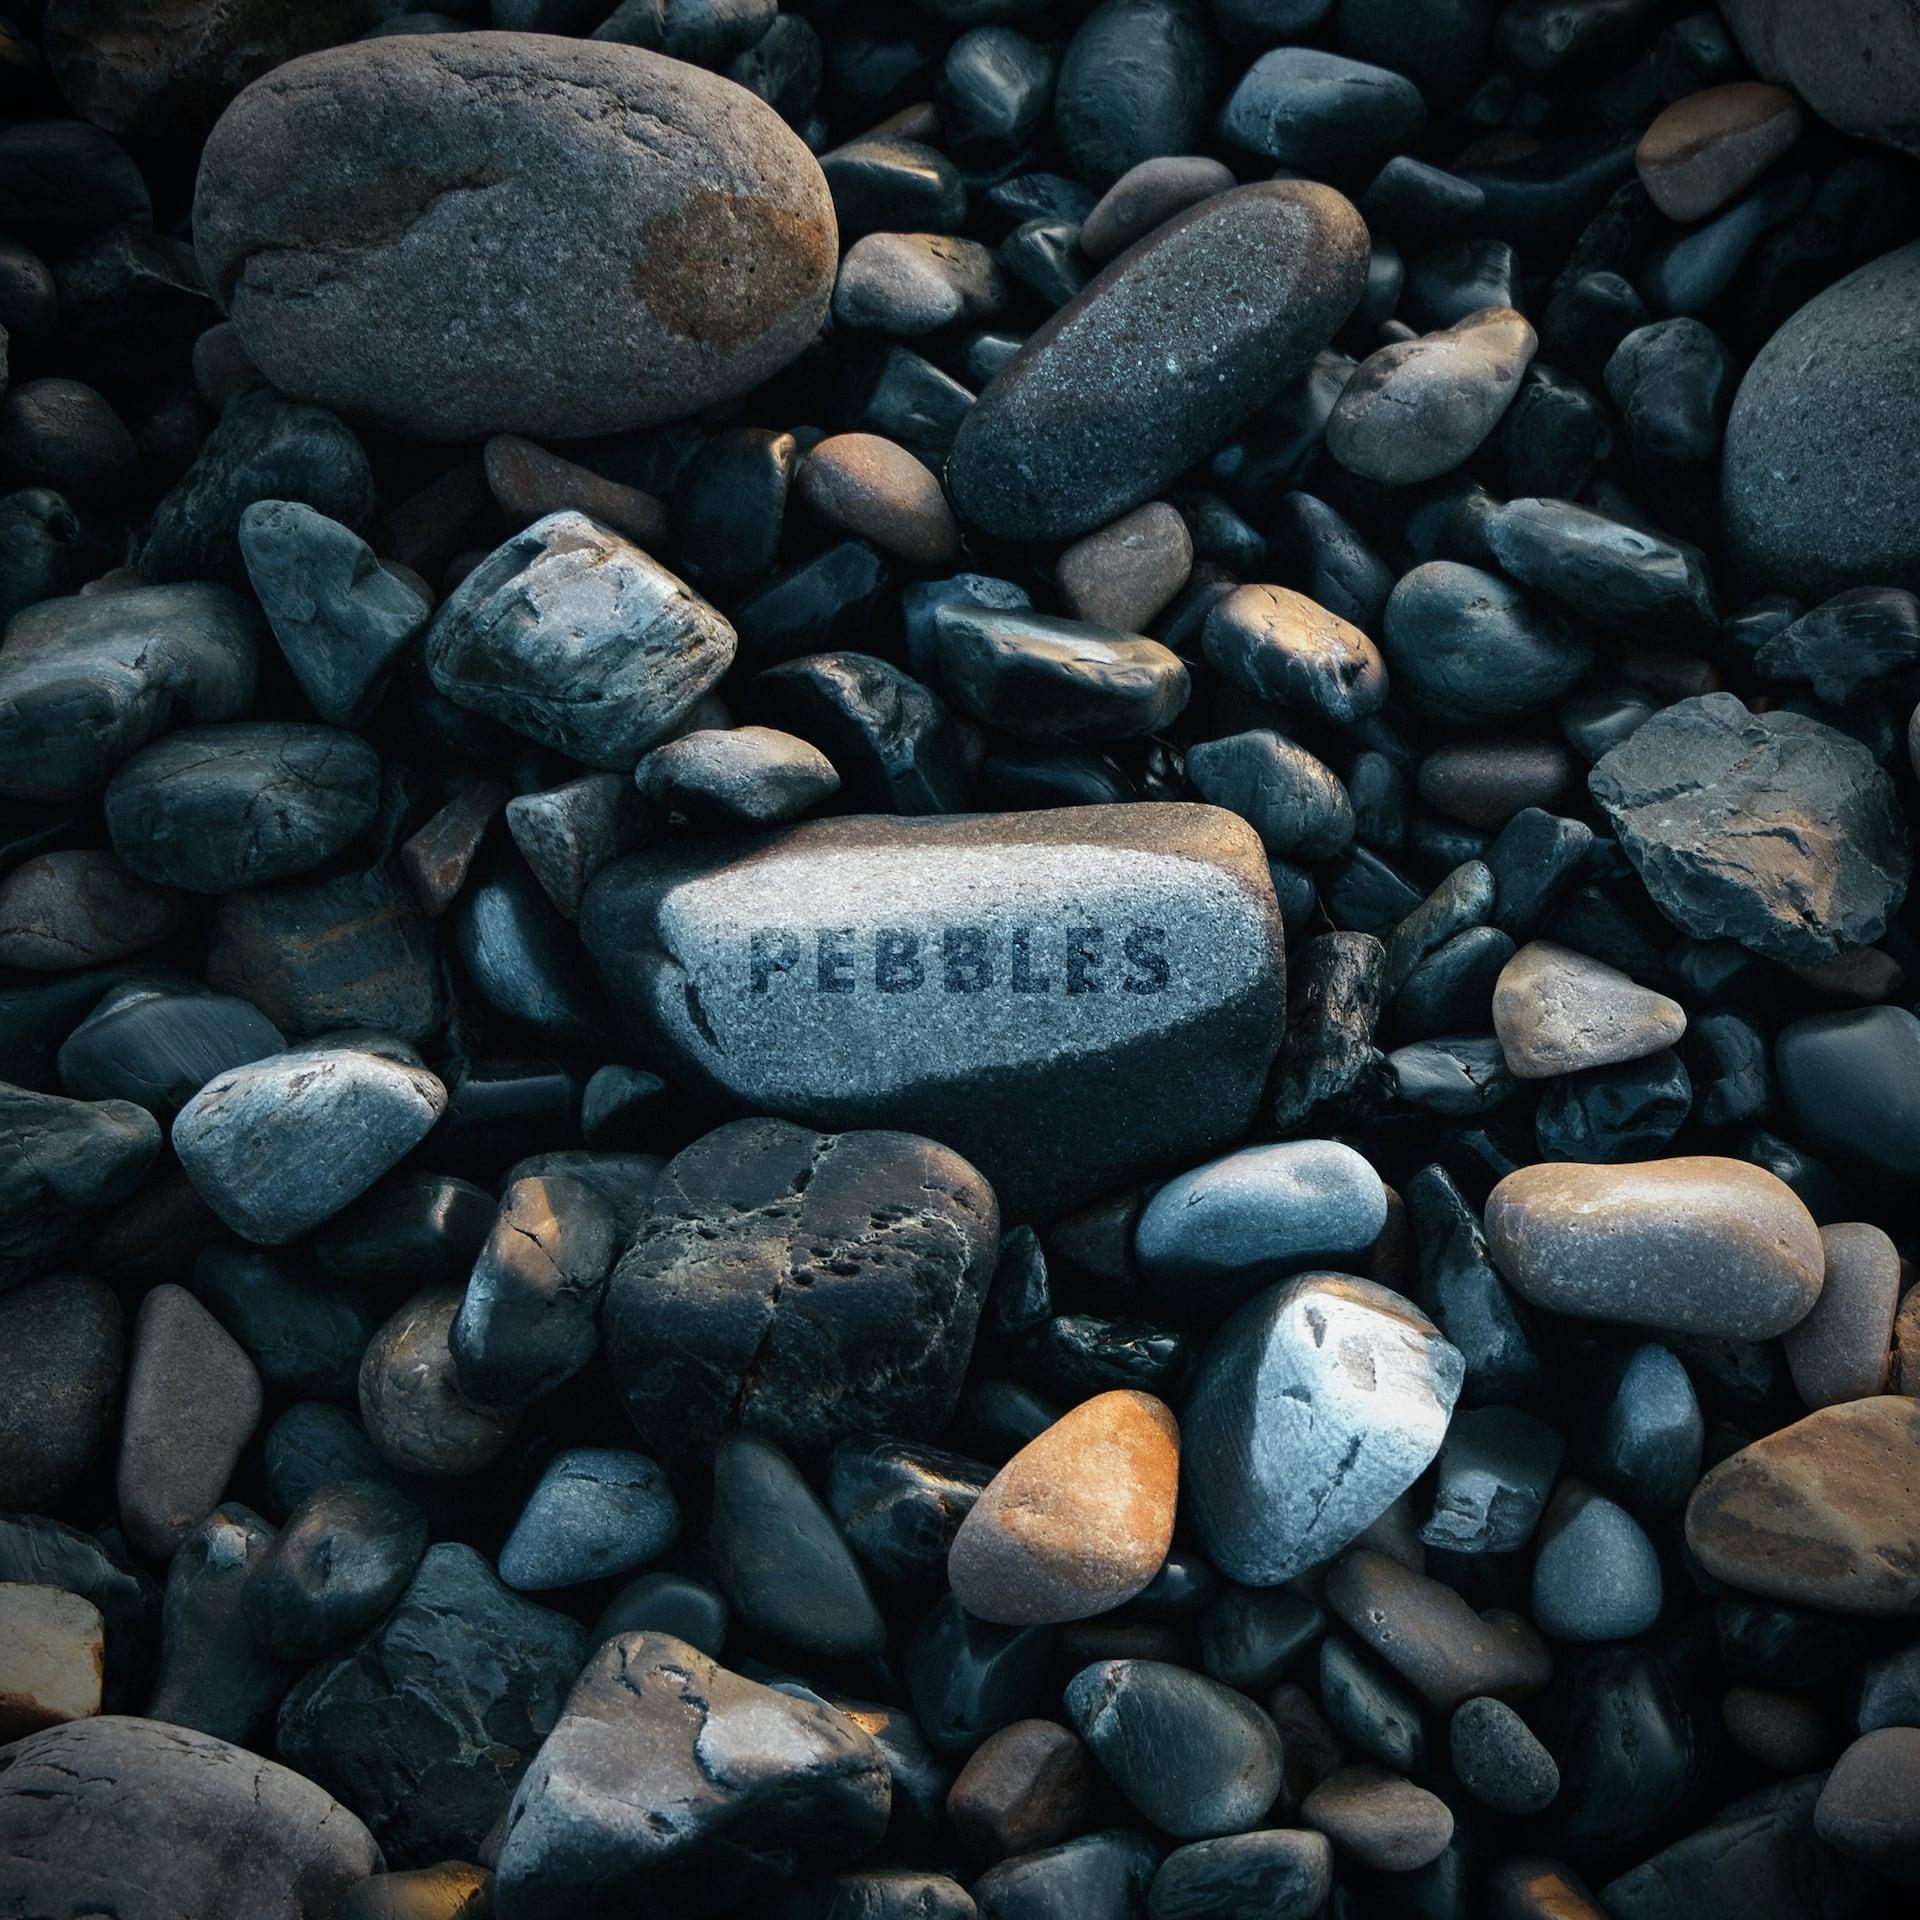 Pebbles Artwork